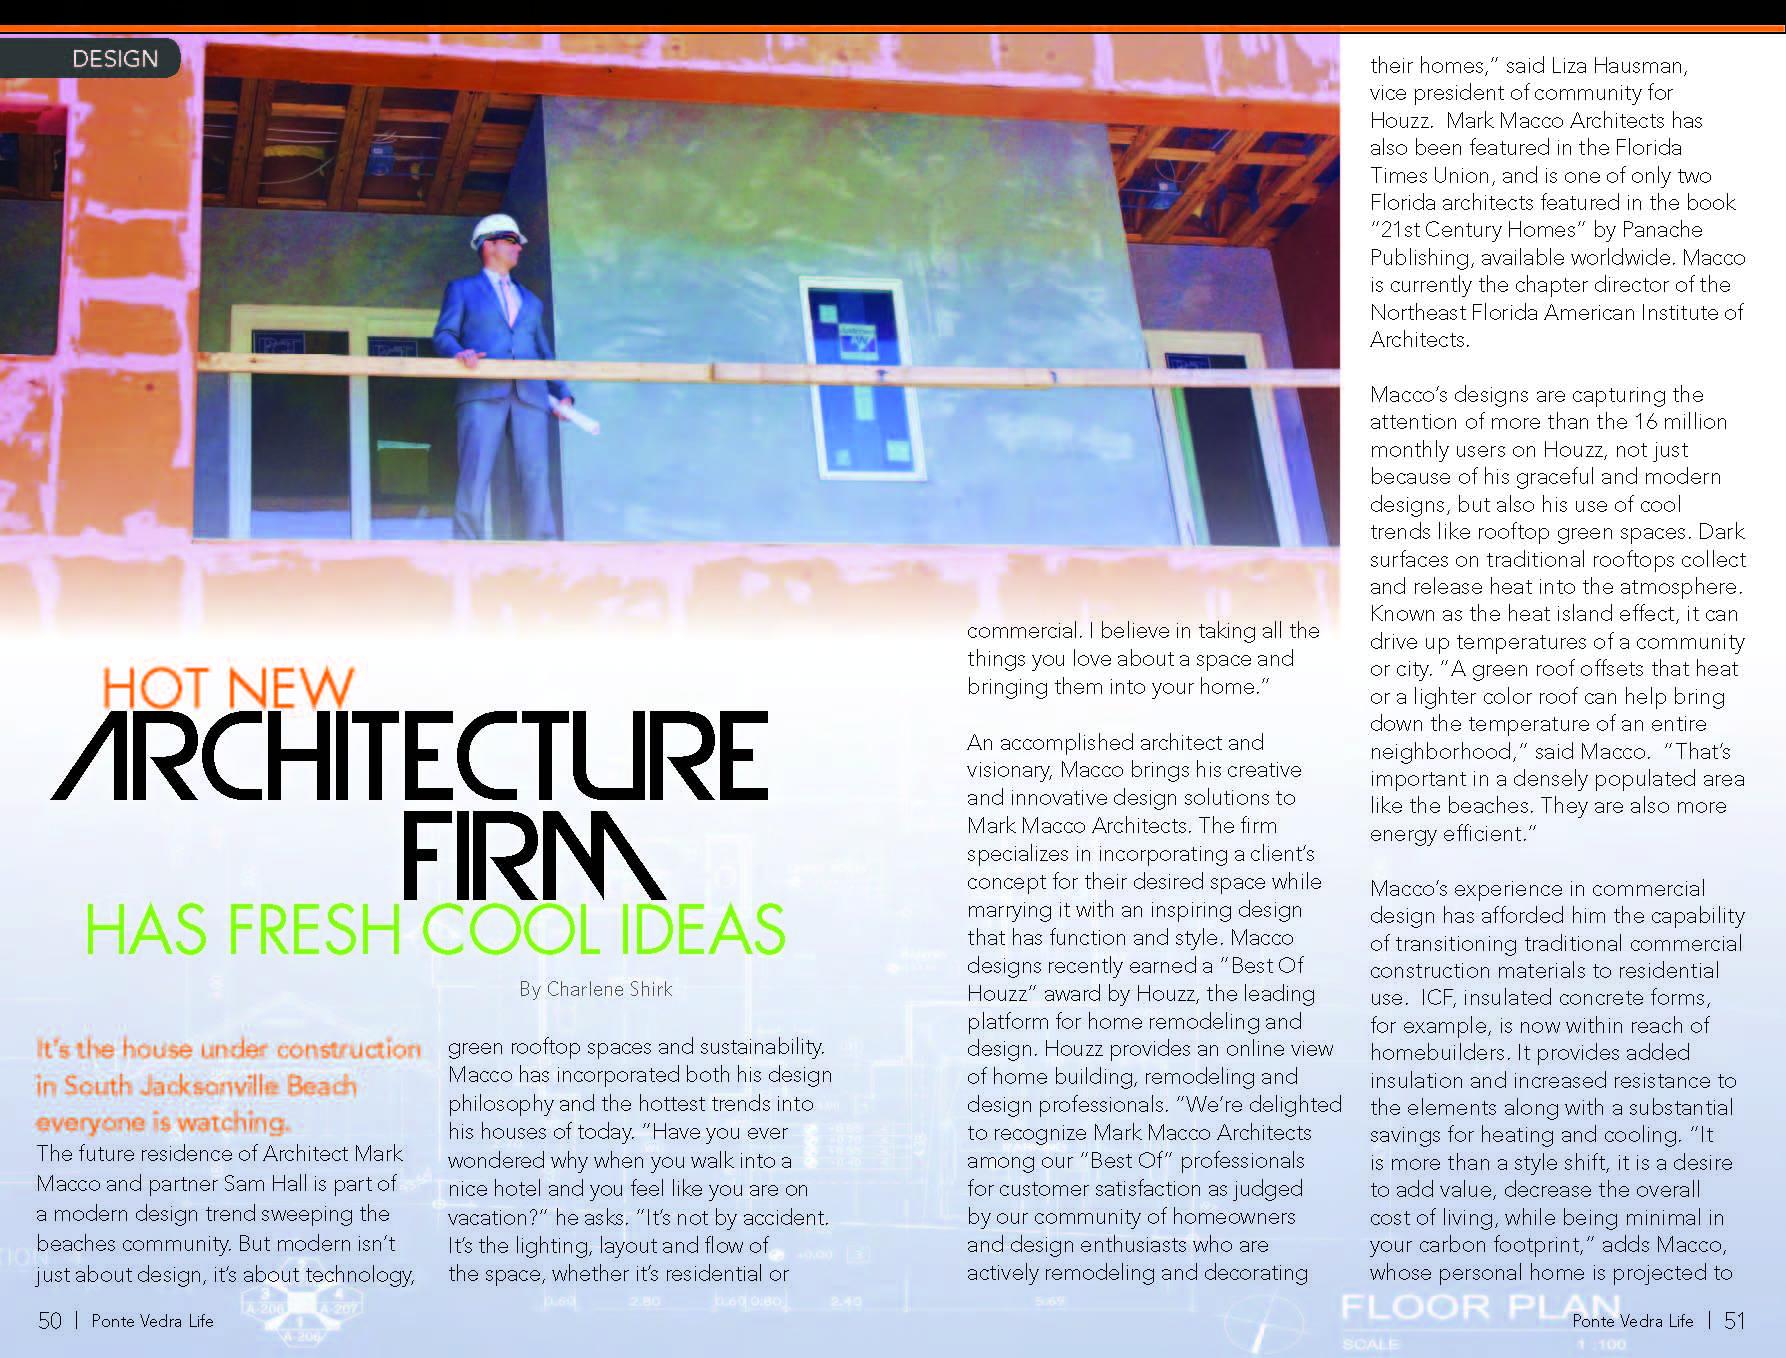 Mark Macco Architects Featured In Ponte Vedra Life Coastal Magazine Article MACCO GOLF14 Page 1